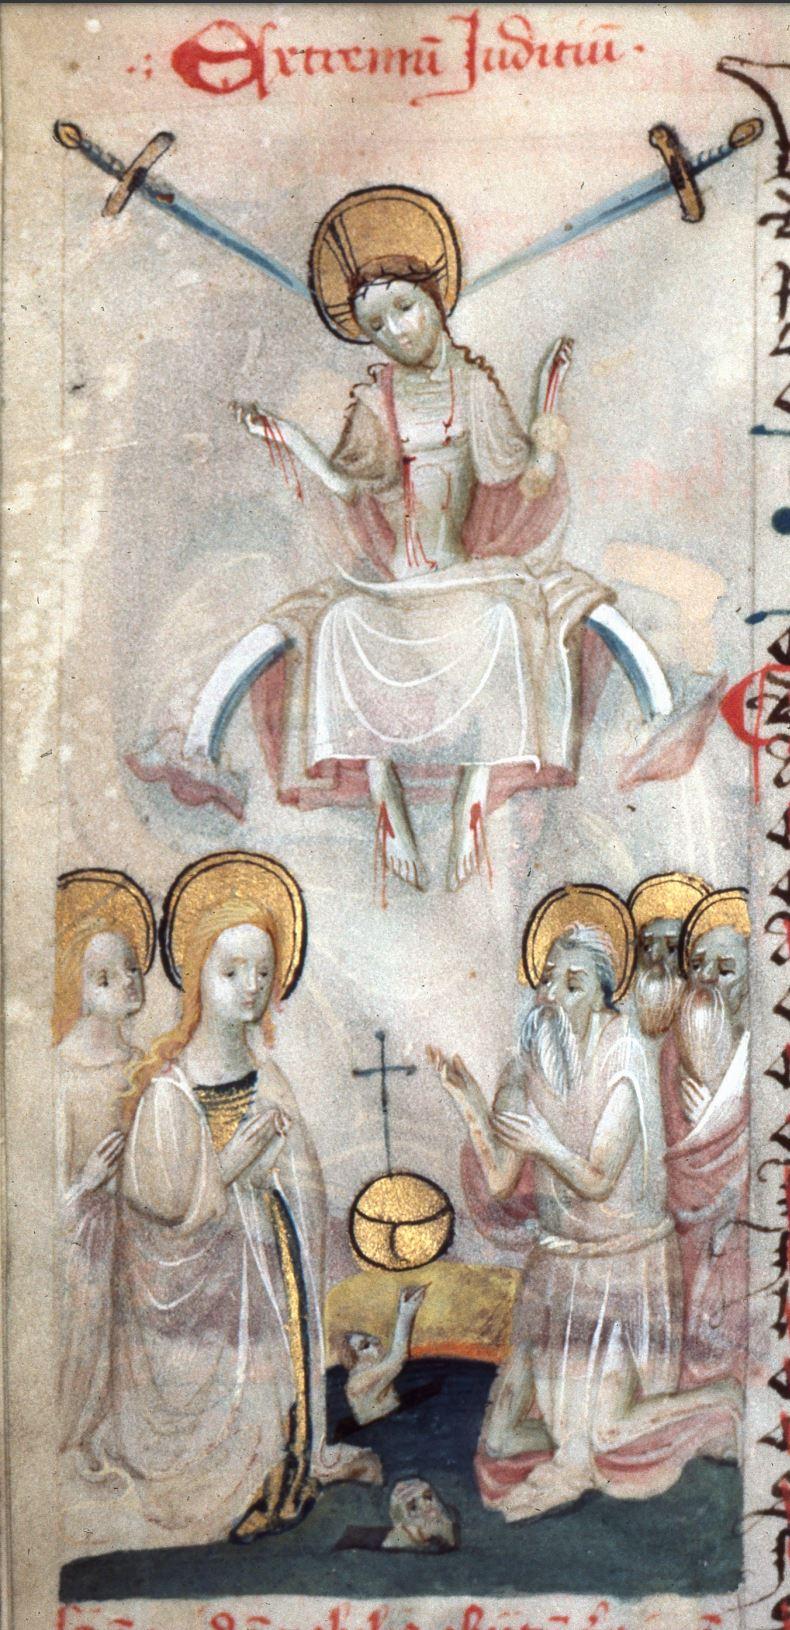 Speculum humanae salvationis 1415 -1425, Kanonie sv. Petra a Pavla 80, fol. 44v haut